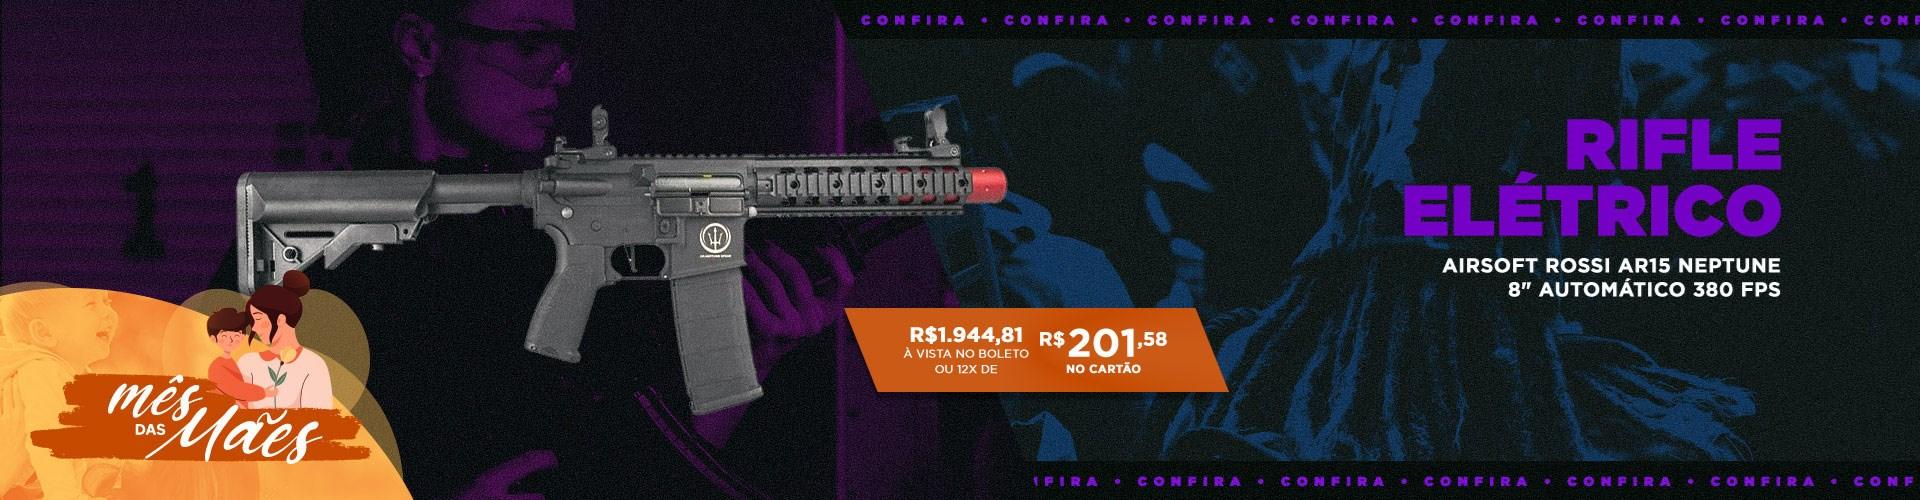 "Rifle Elétrico Airsoft Rossi AR15 Neptune 8"""